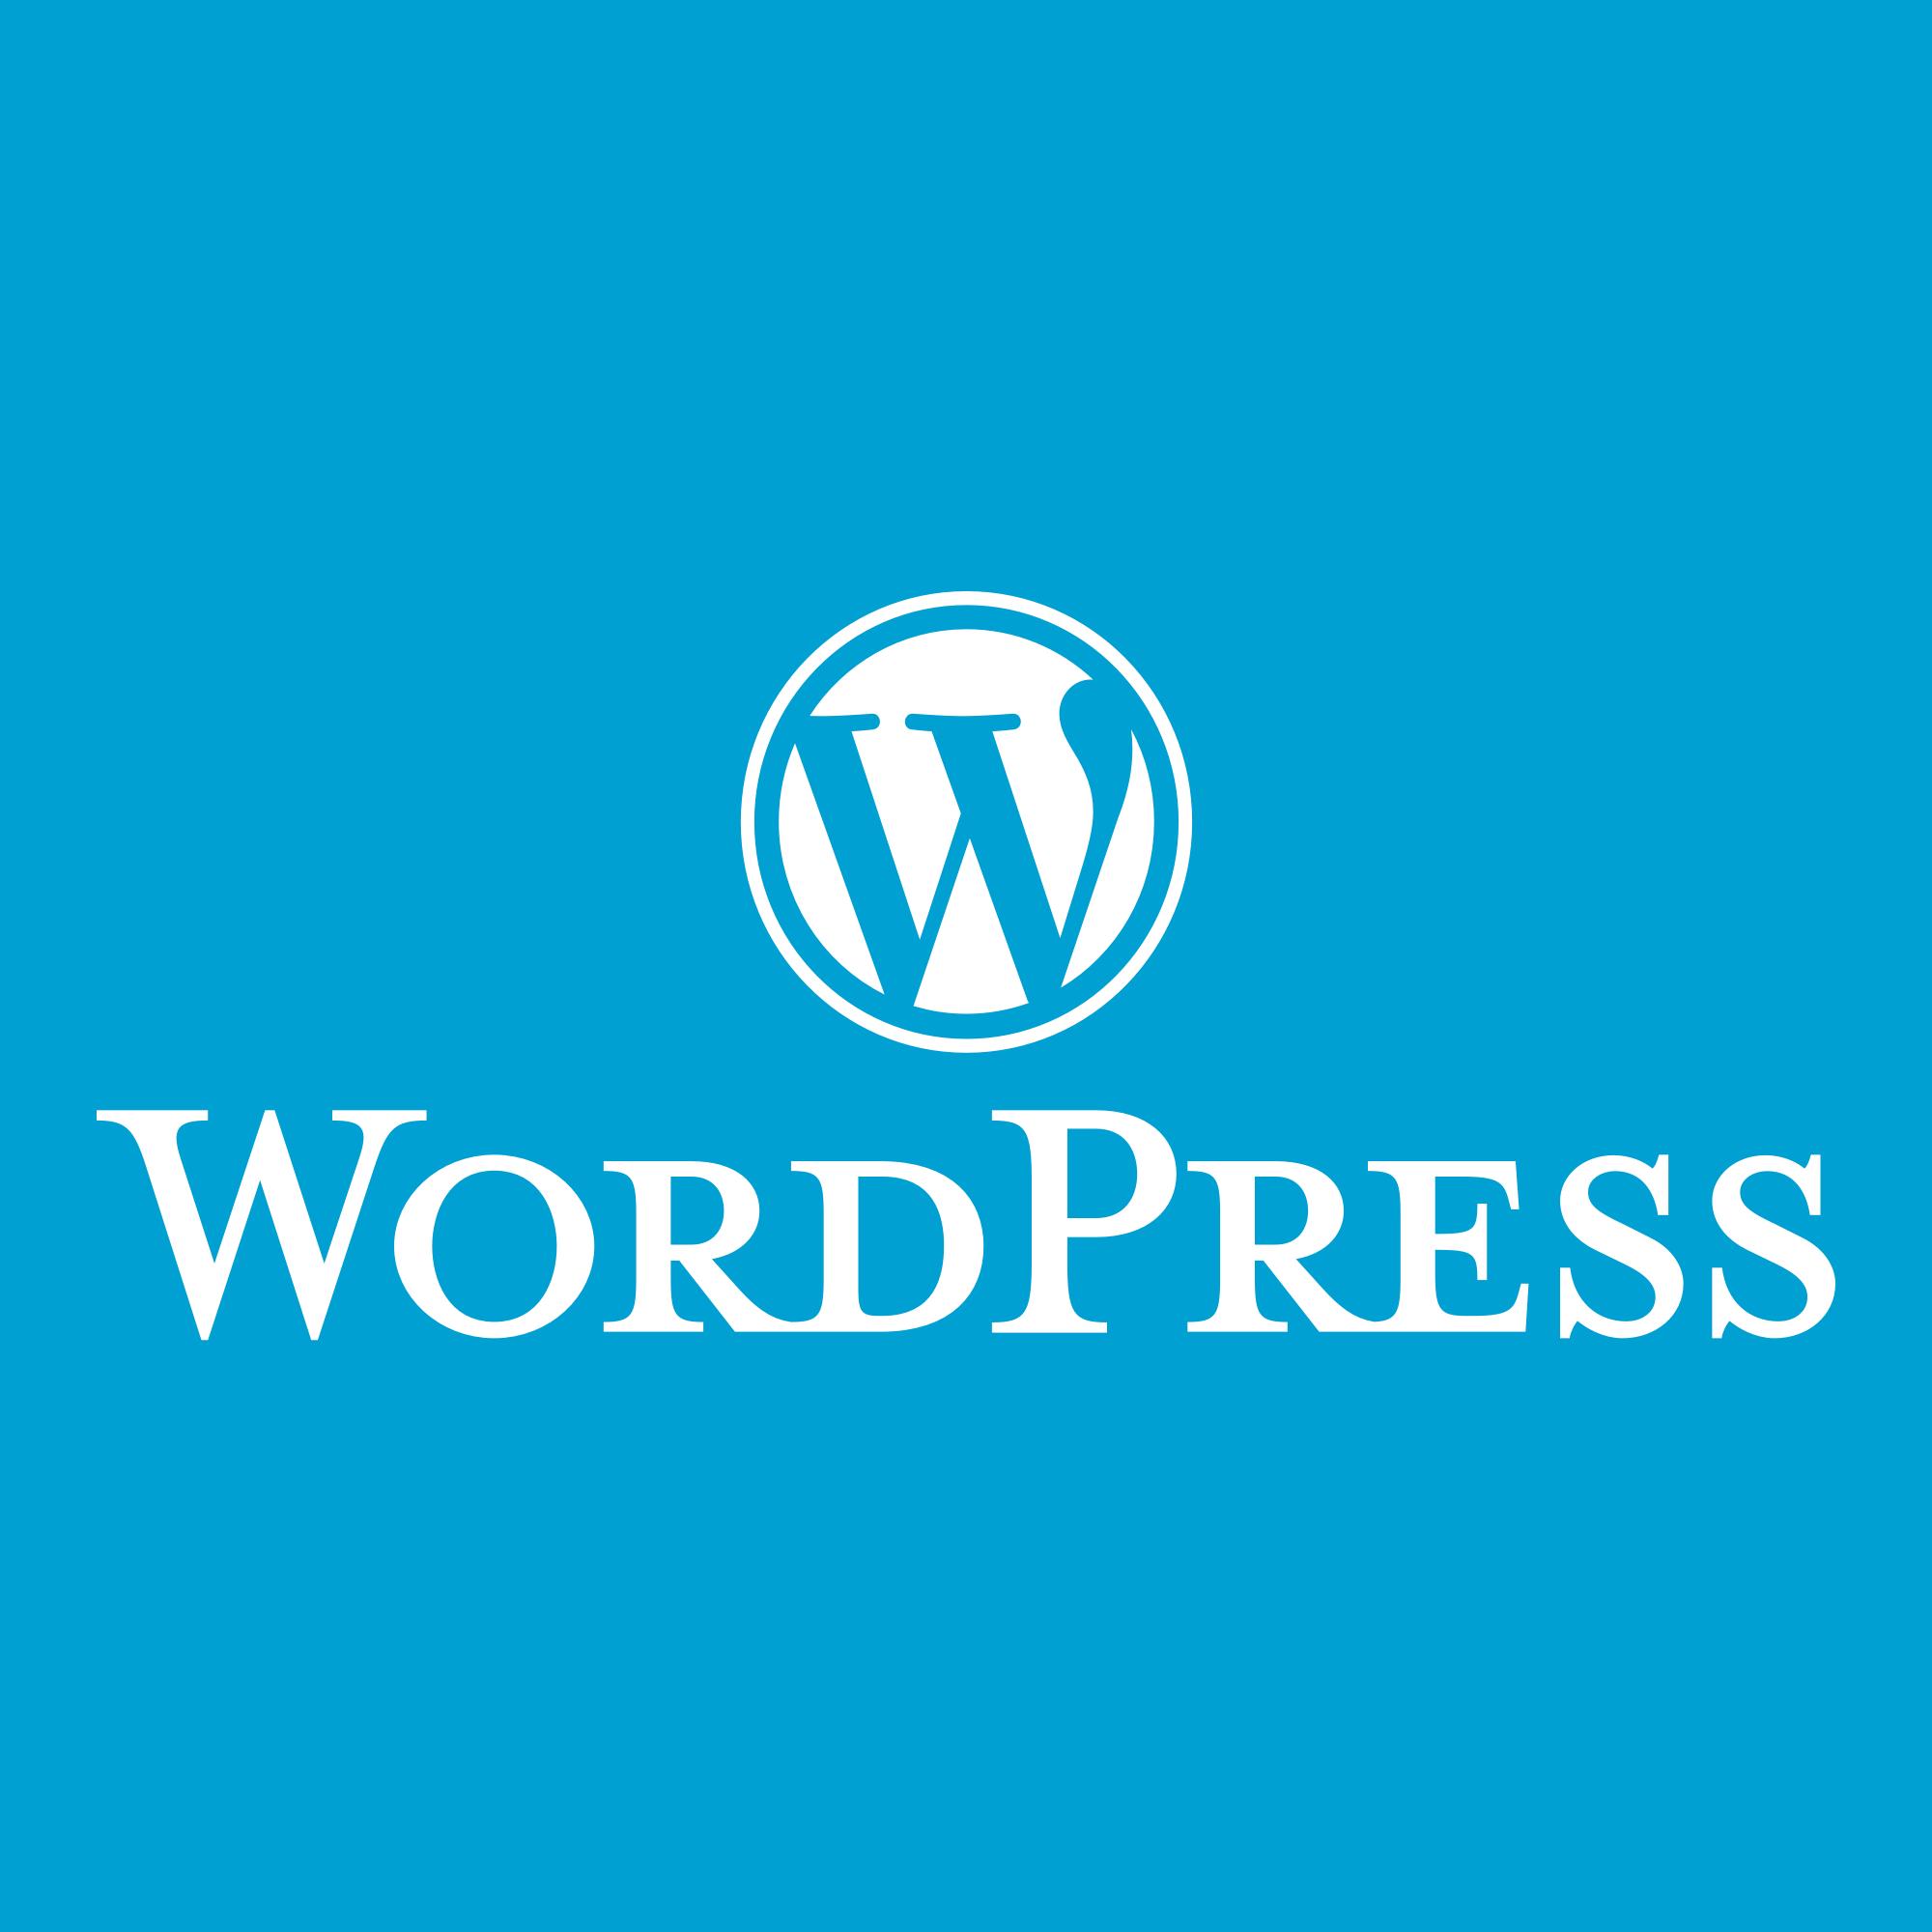 wordpress curso online aprender wordpress curso de wordpress gratis